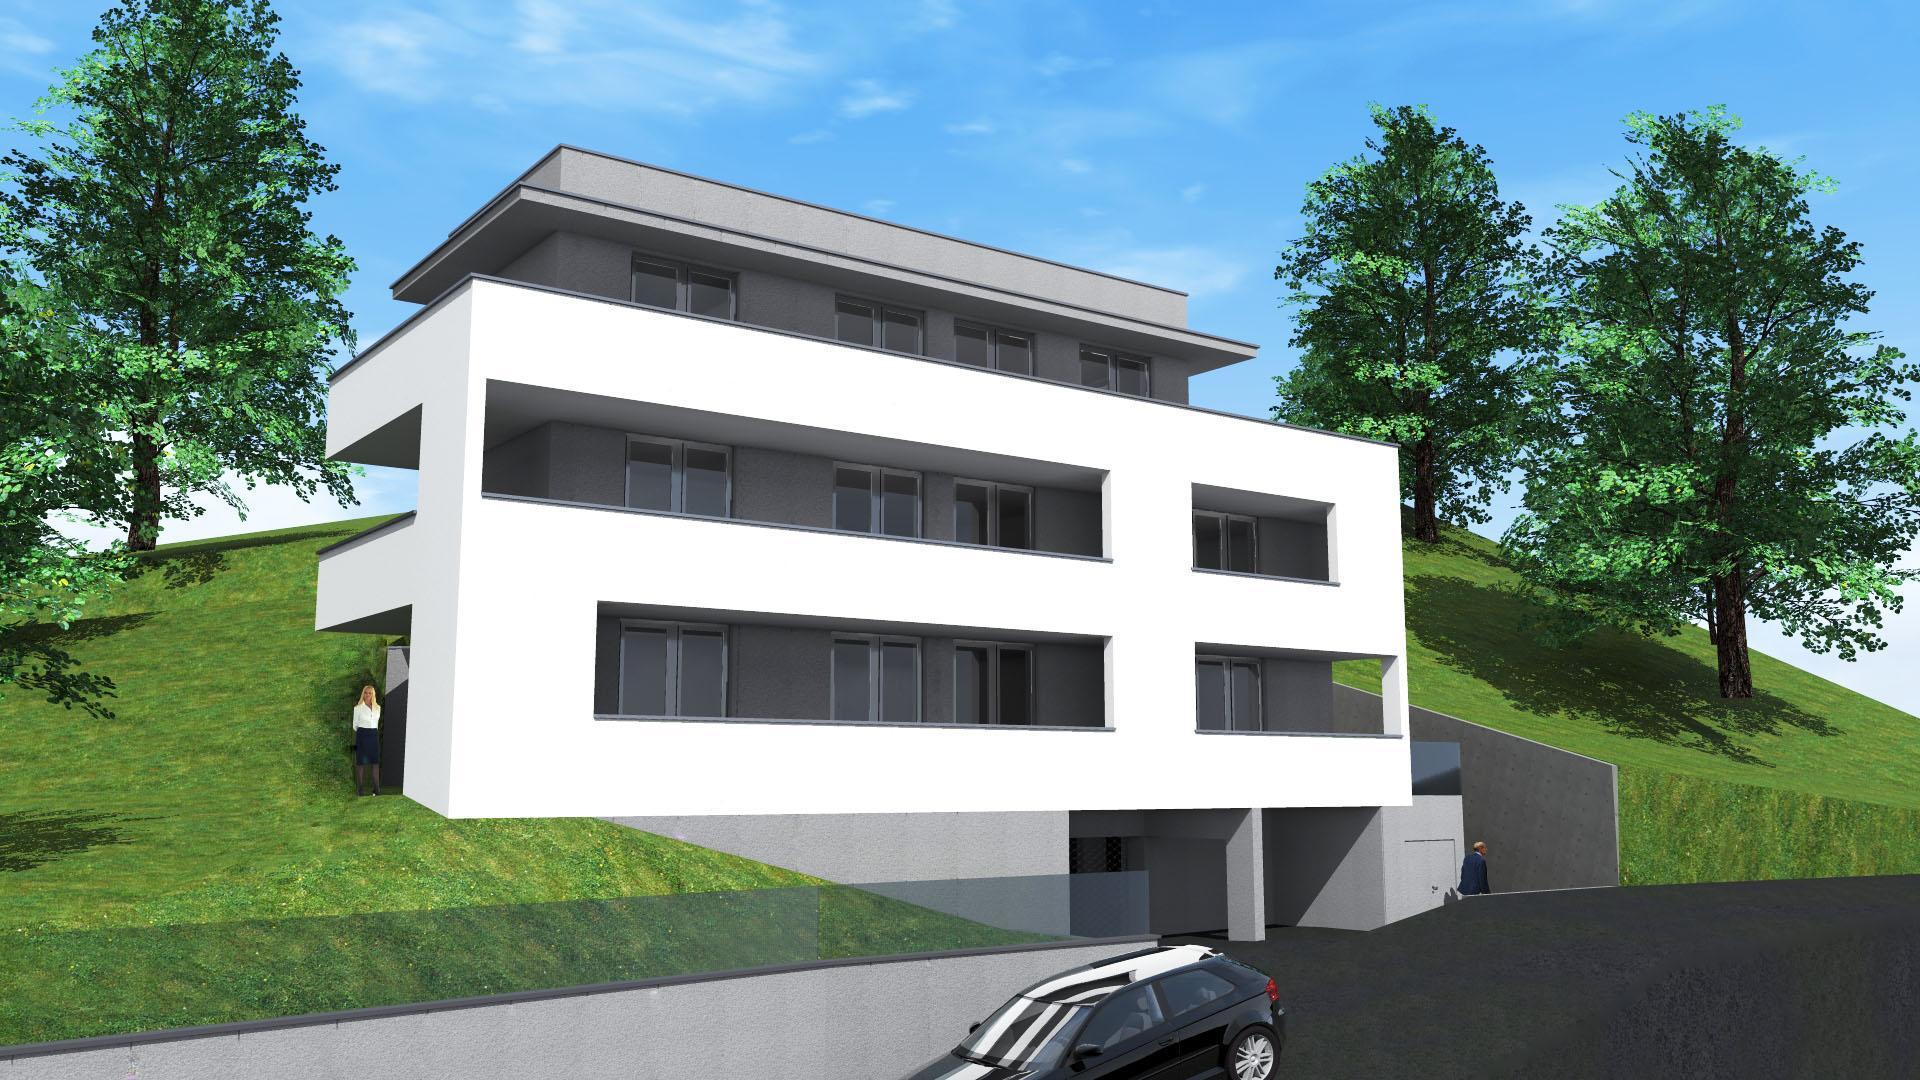 mehrfamilienhaus plesching 4040 plesching sterreich immobilie id28 fahrner gmbh. Black Bedroom Furniture Sets. Home Design Ideas